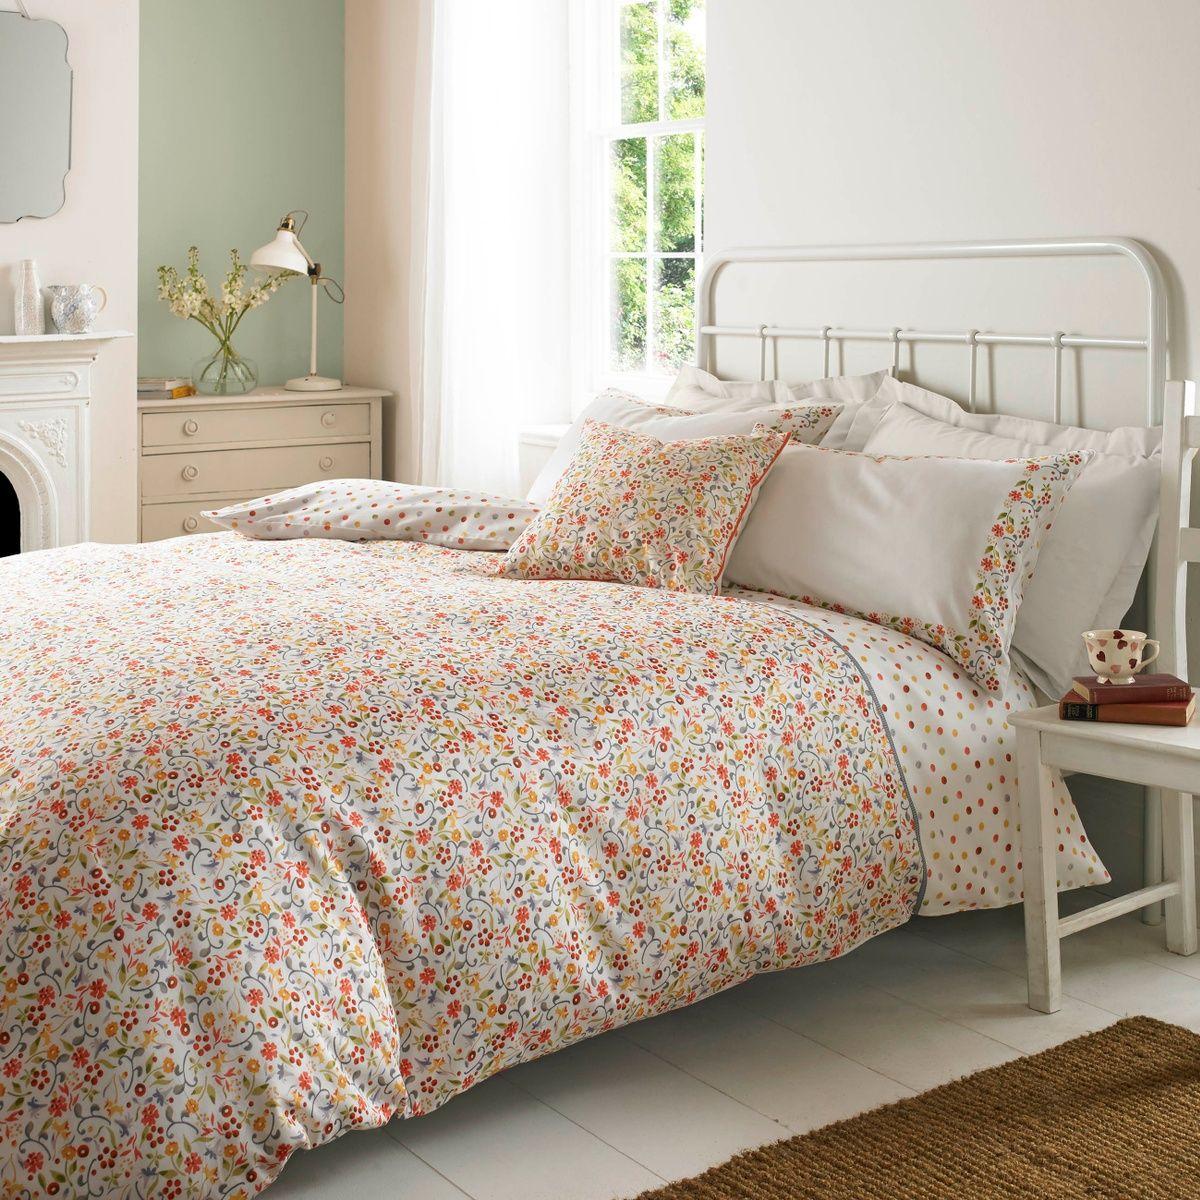 Terrence Conran MOTION Designer Teal /& Grey Bedding 100/% Cotton Duvet Cover Set